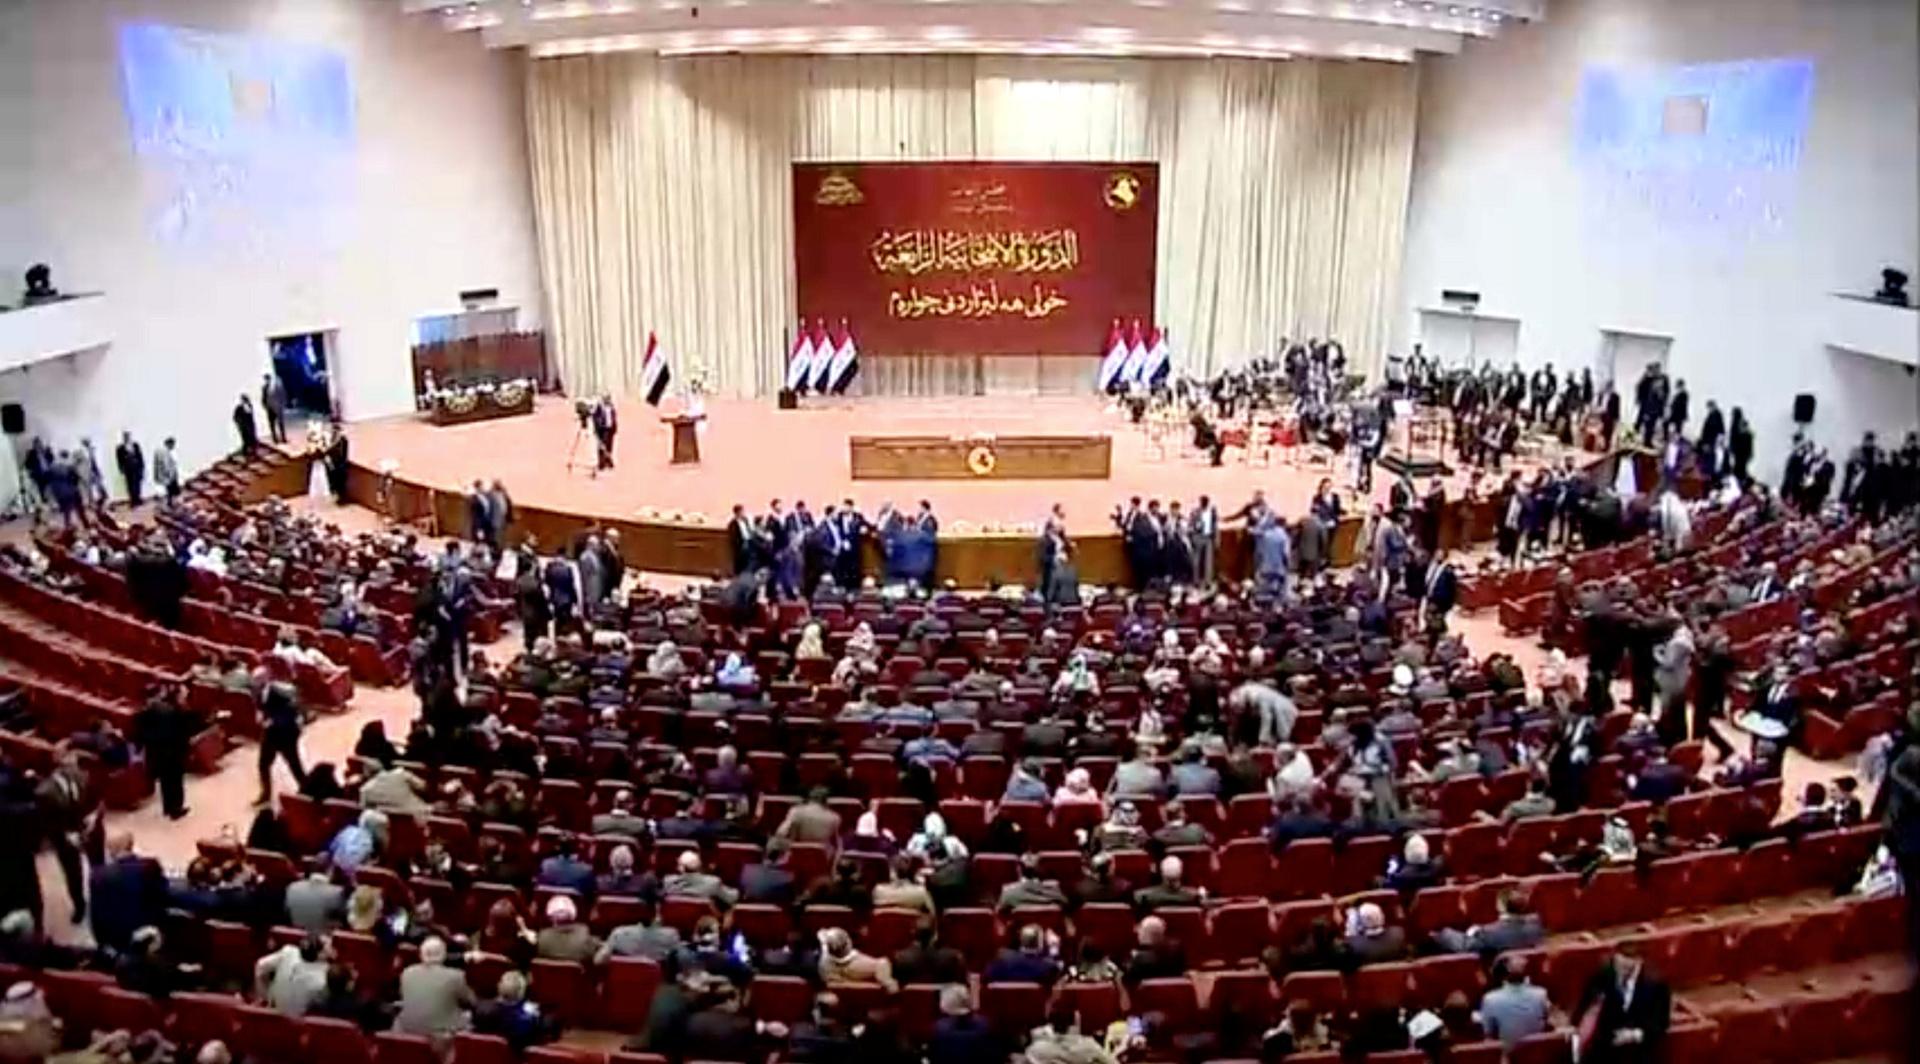 RT تنشر نص القرار المطروح للتصويت في البرلمان العراقي